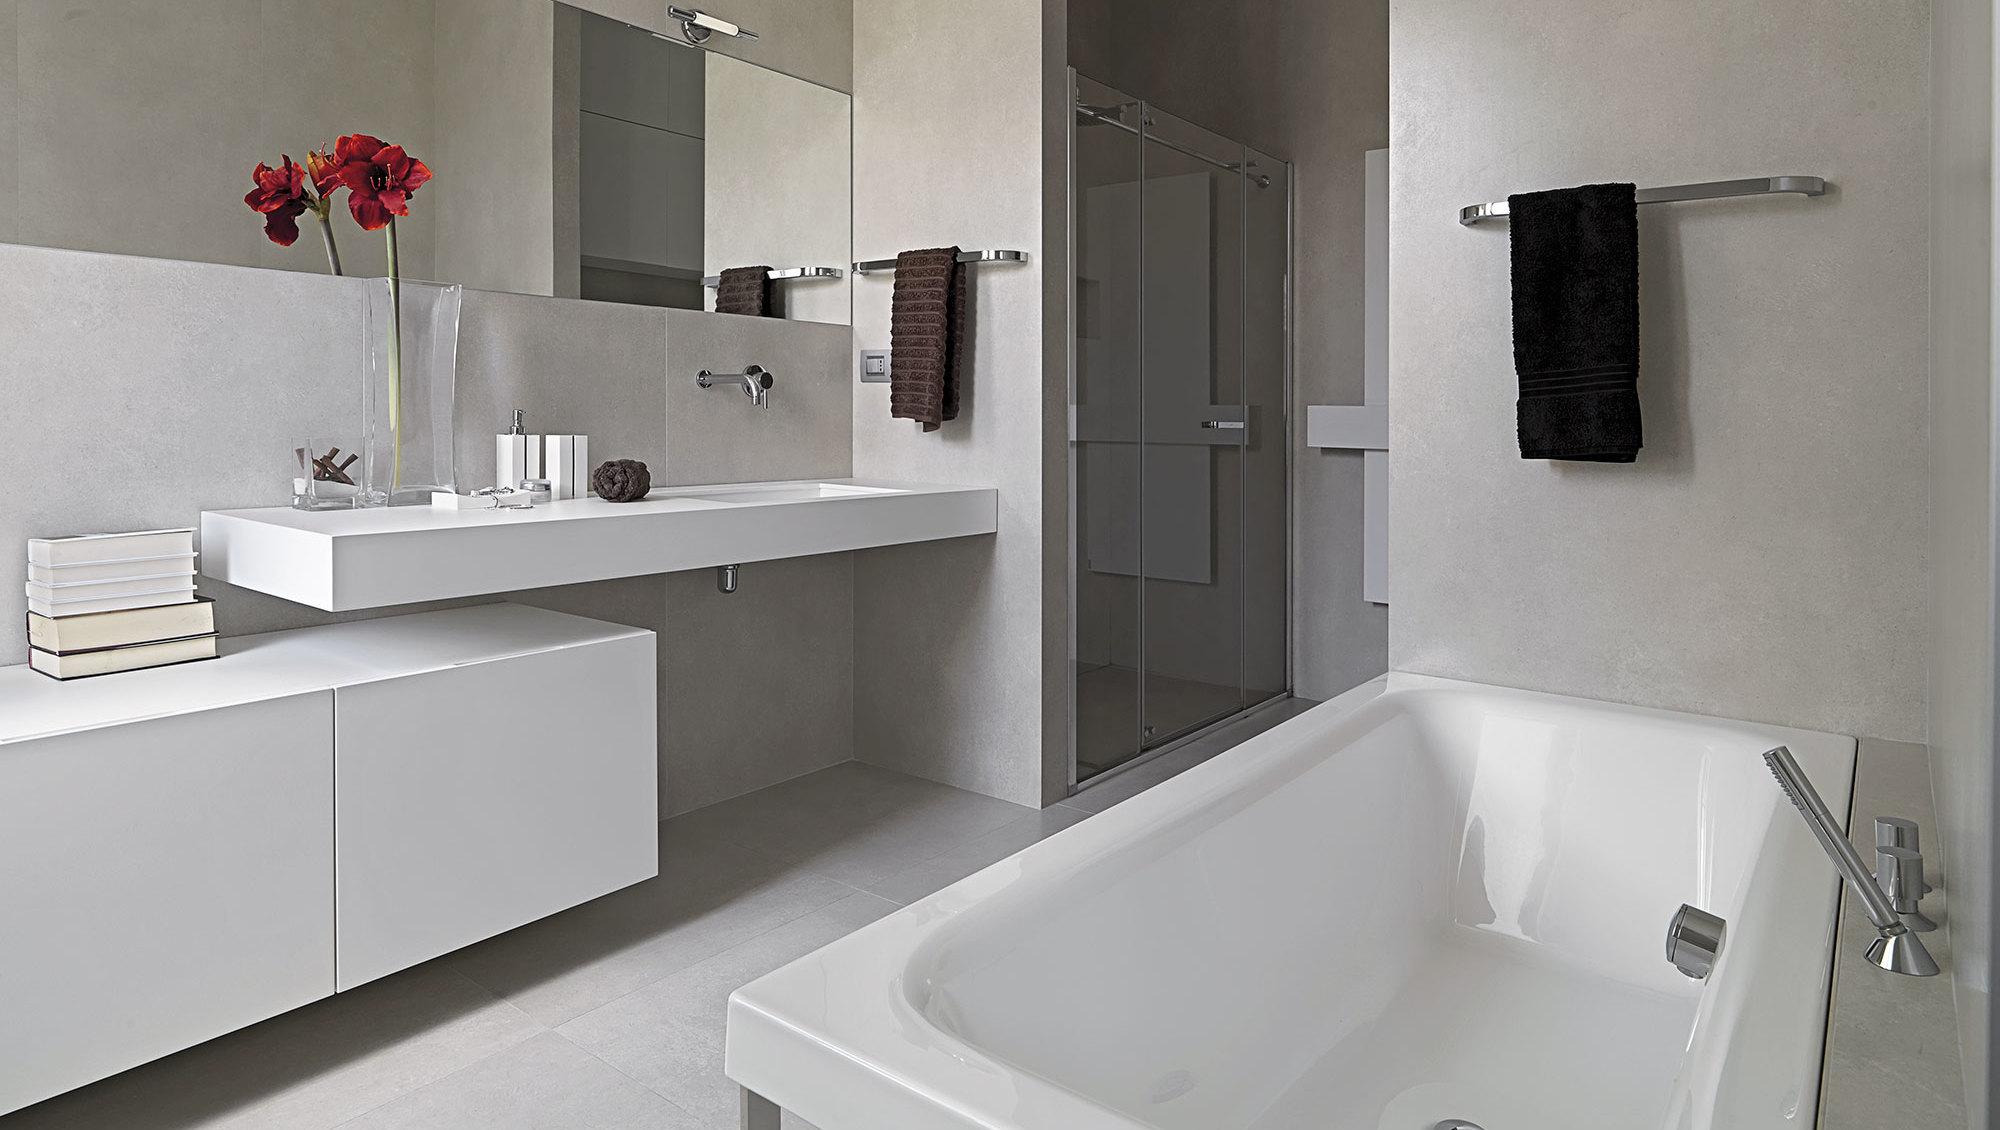 Plumbing expert in a home in Auckland